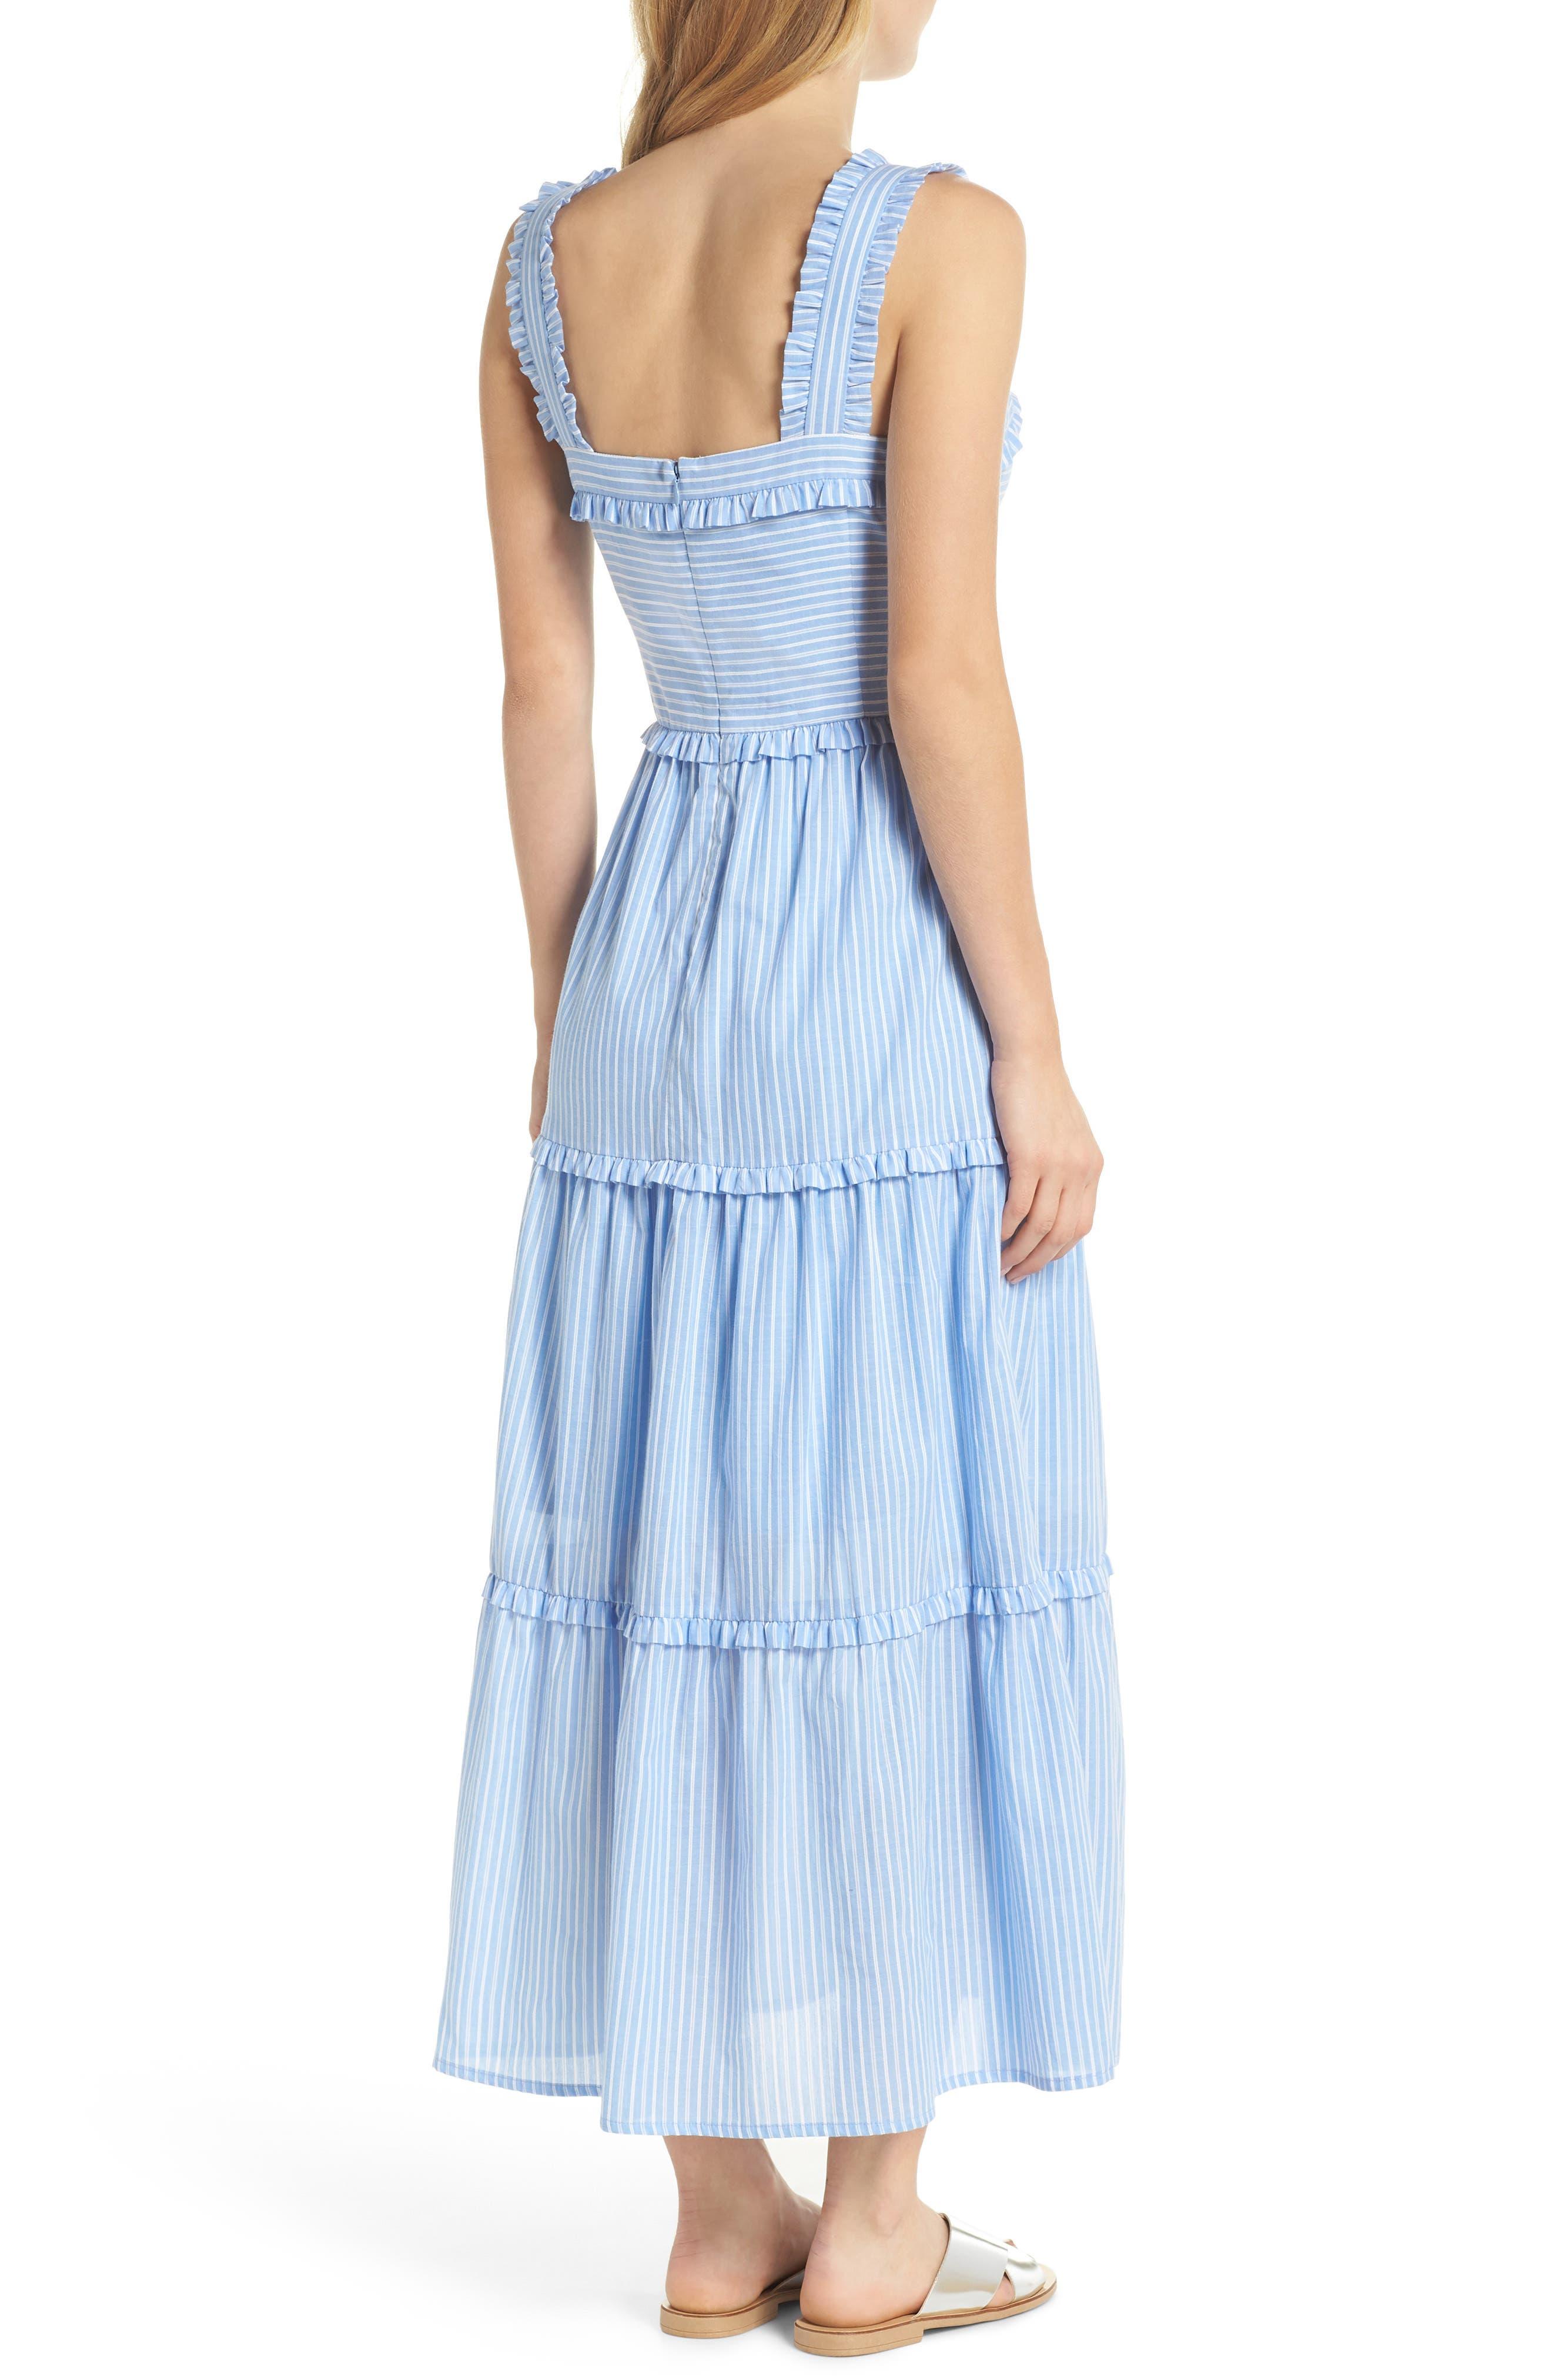 Courtney Rio Stripe Lawn Maxi Dress,                             Alternate thumbnail 3, color,                             Blue/ White